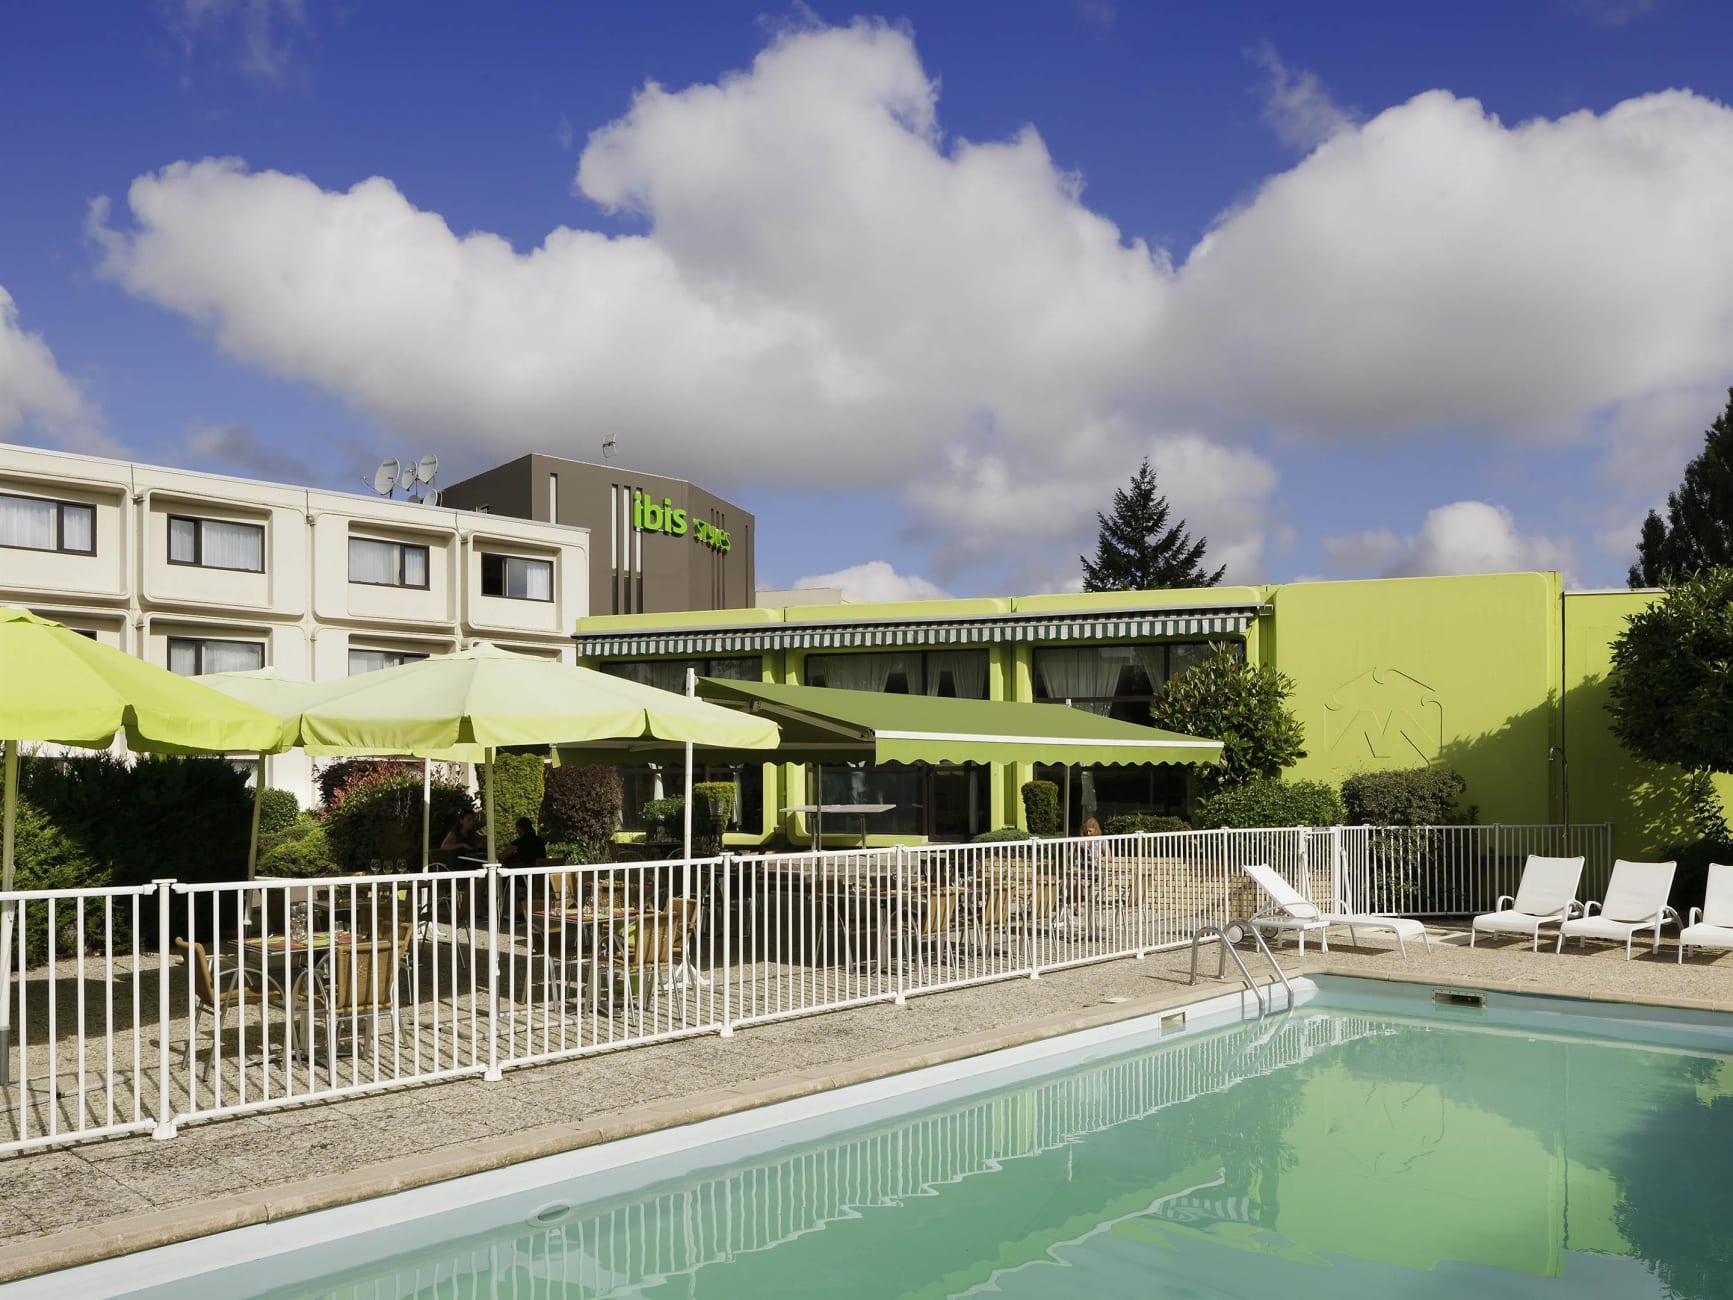 Otel Ibis Styles Chalon-Sur-Saône Hotel, Chalon-Sur-Saône ... destiné Piscine Chalon